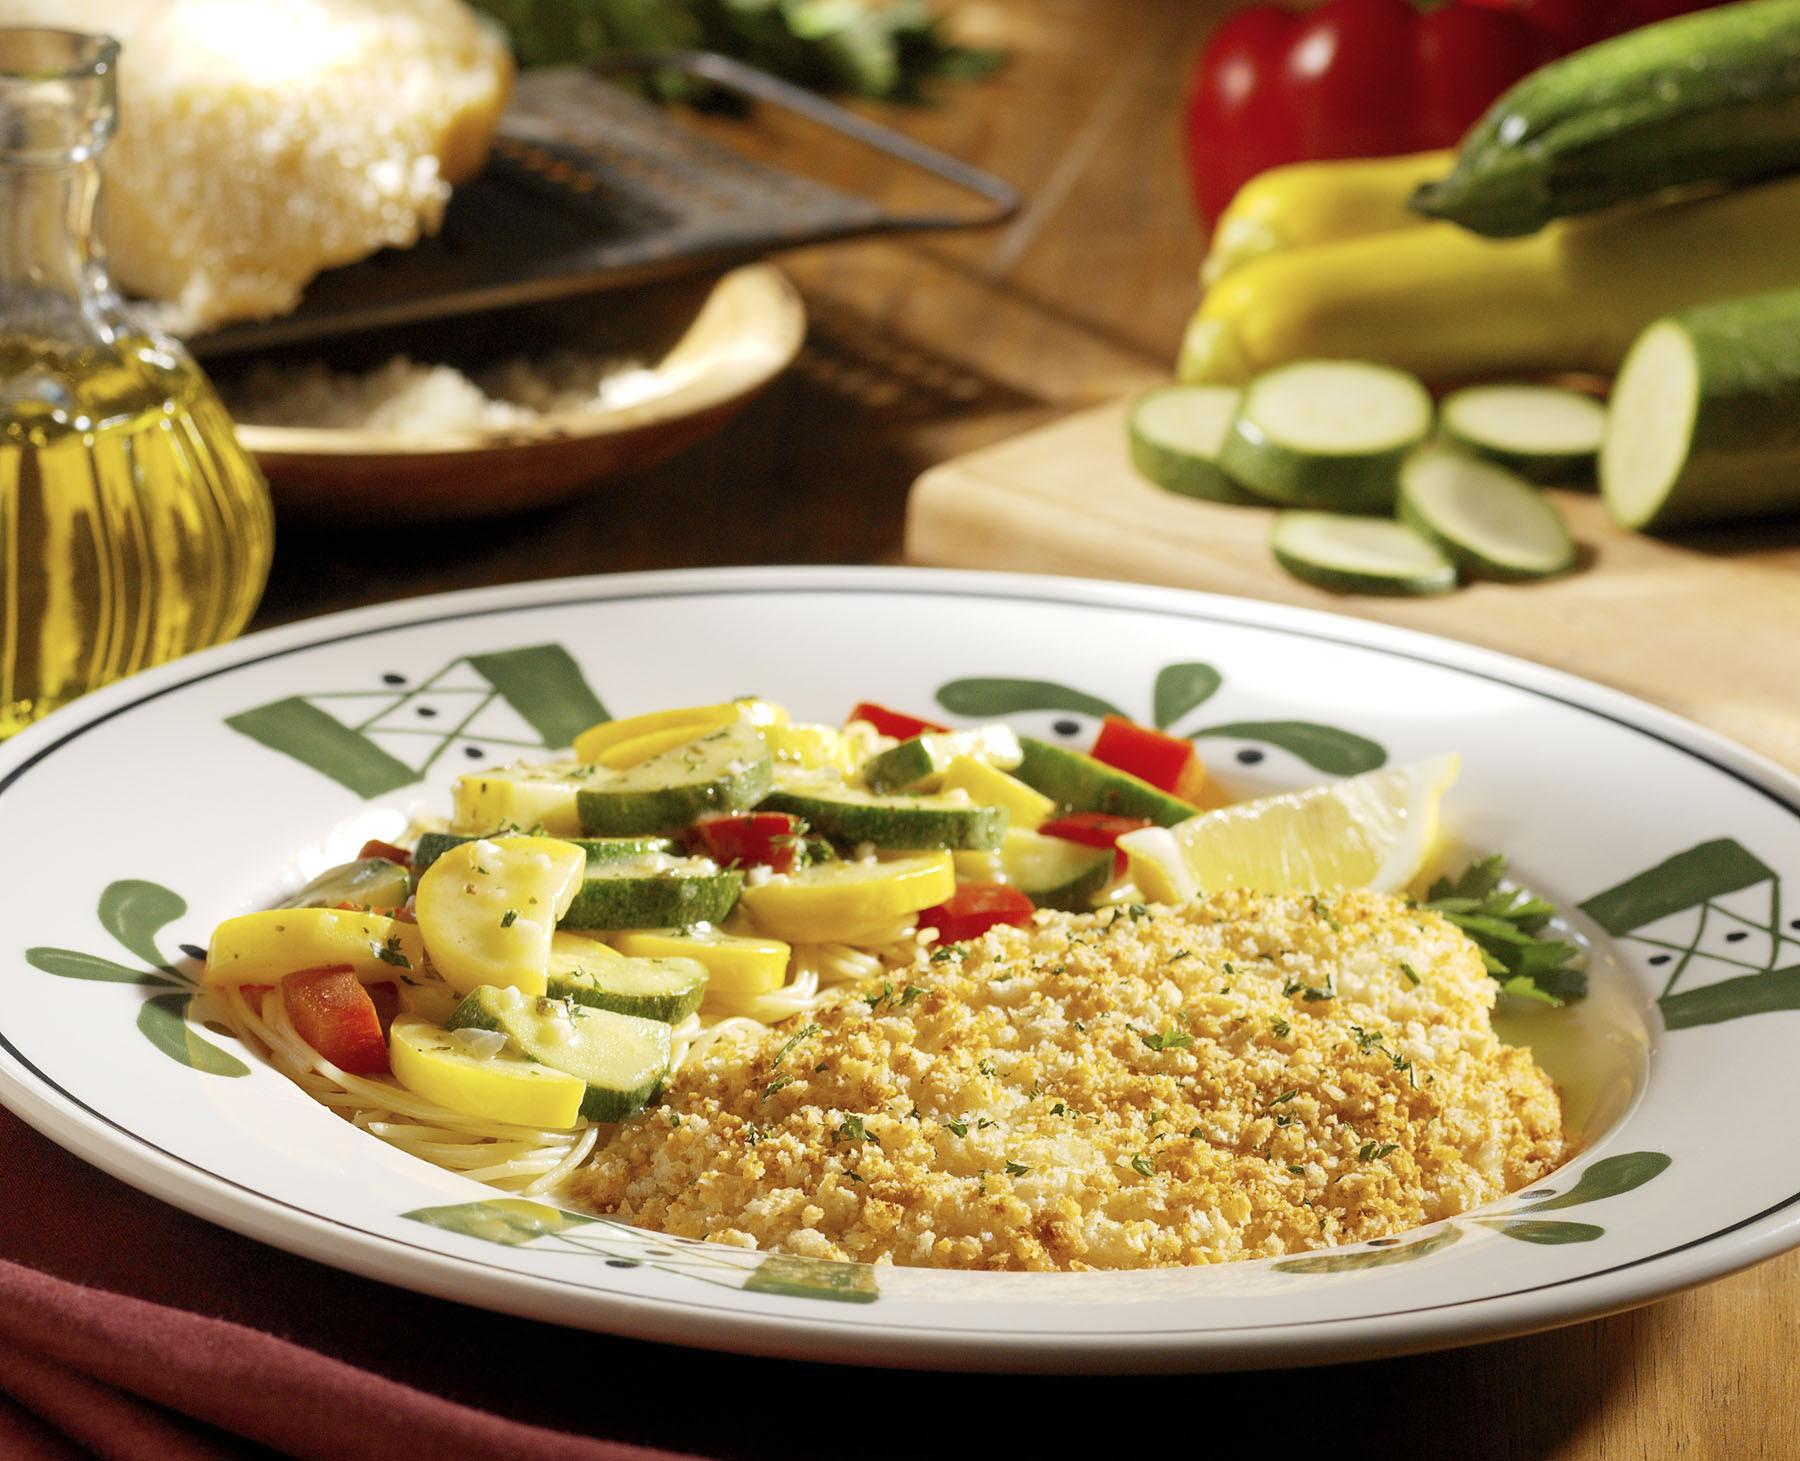 Olive Garden Copycat Recipes Parmesan Crusted Tilapia